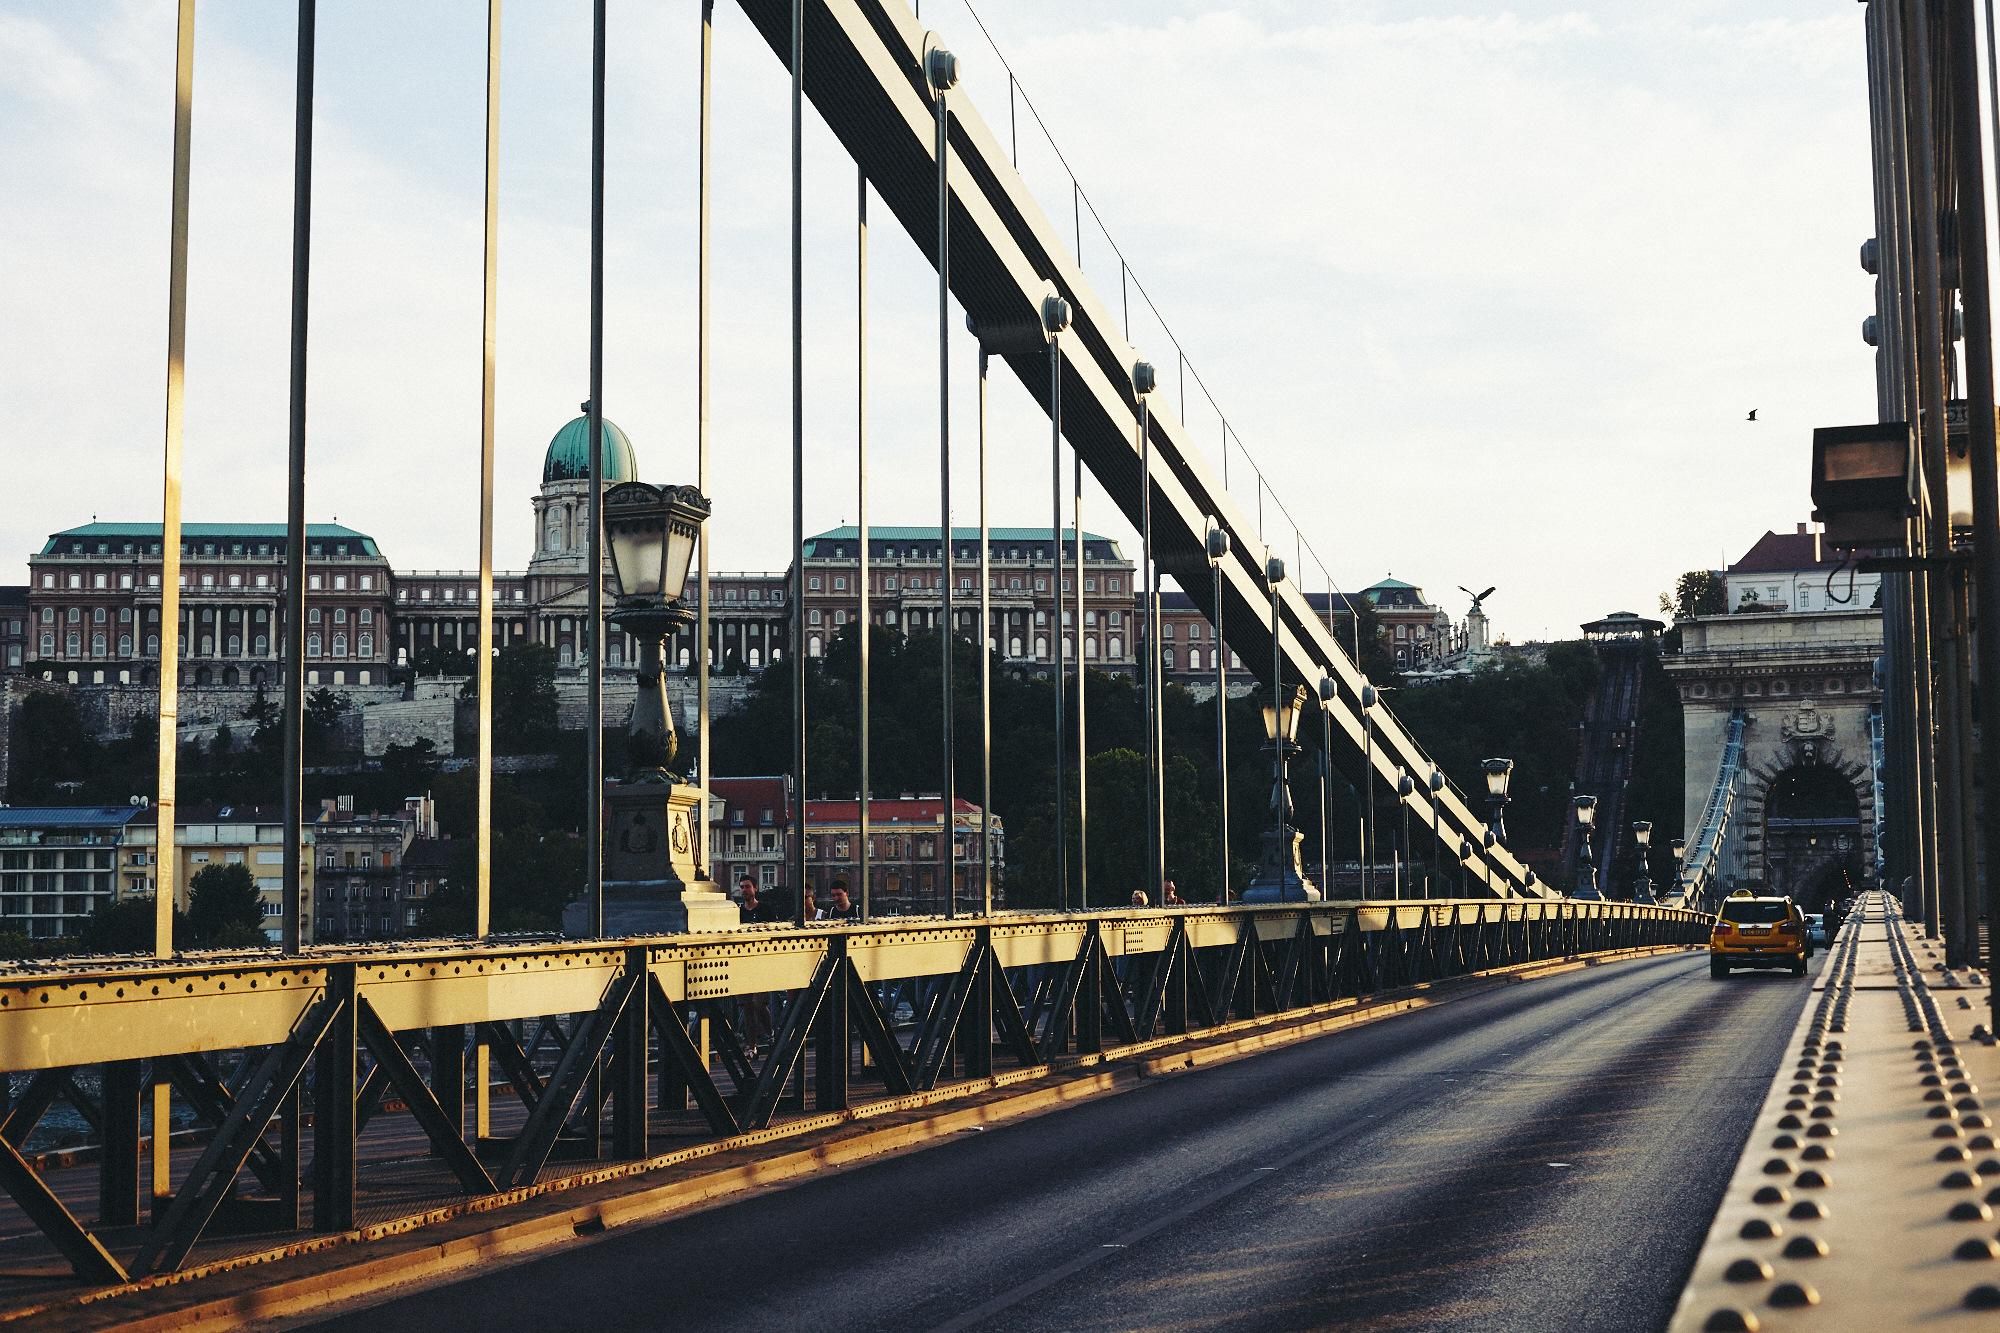 maxmotel_budapest_aug2015_day01_06_danube_bridge_0323